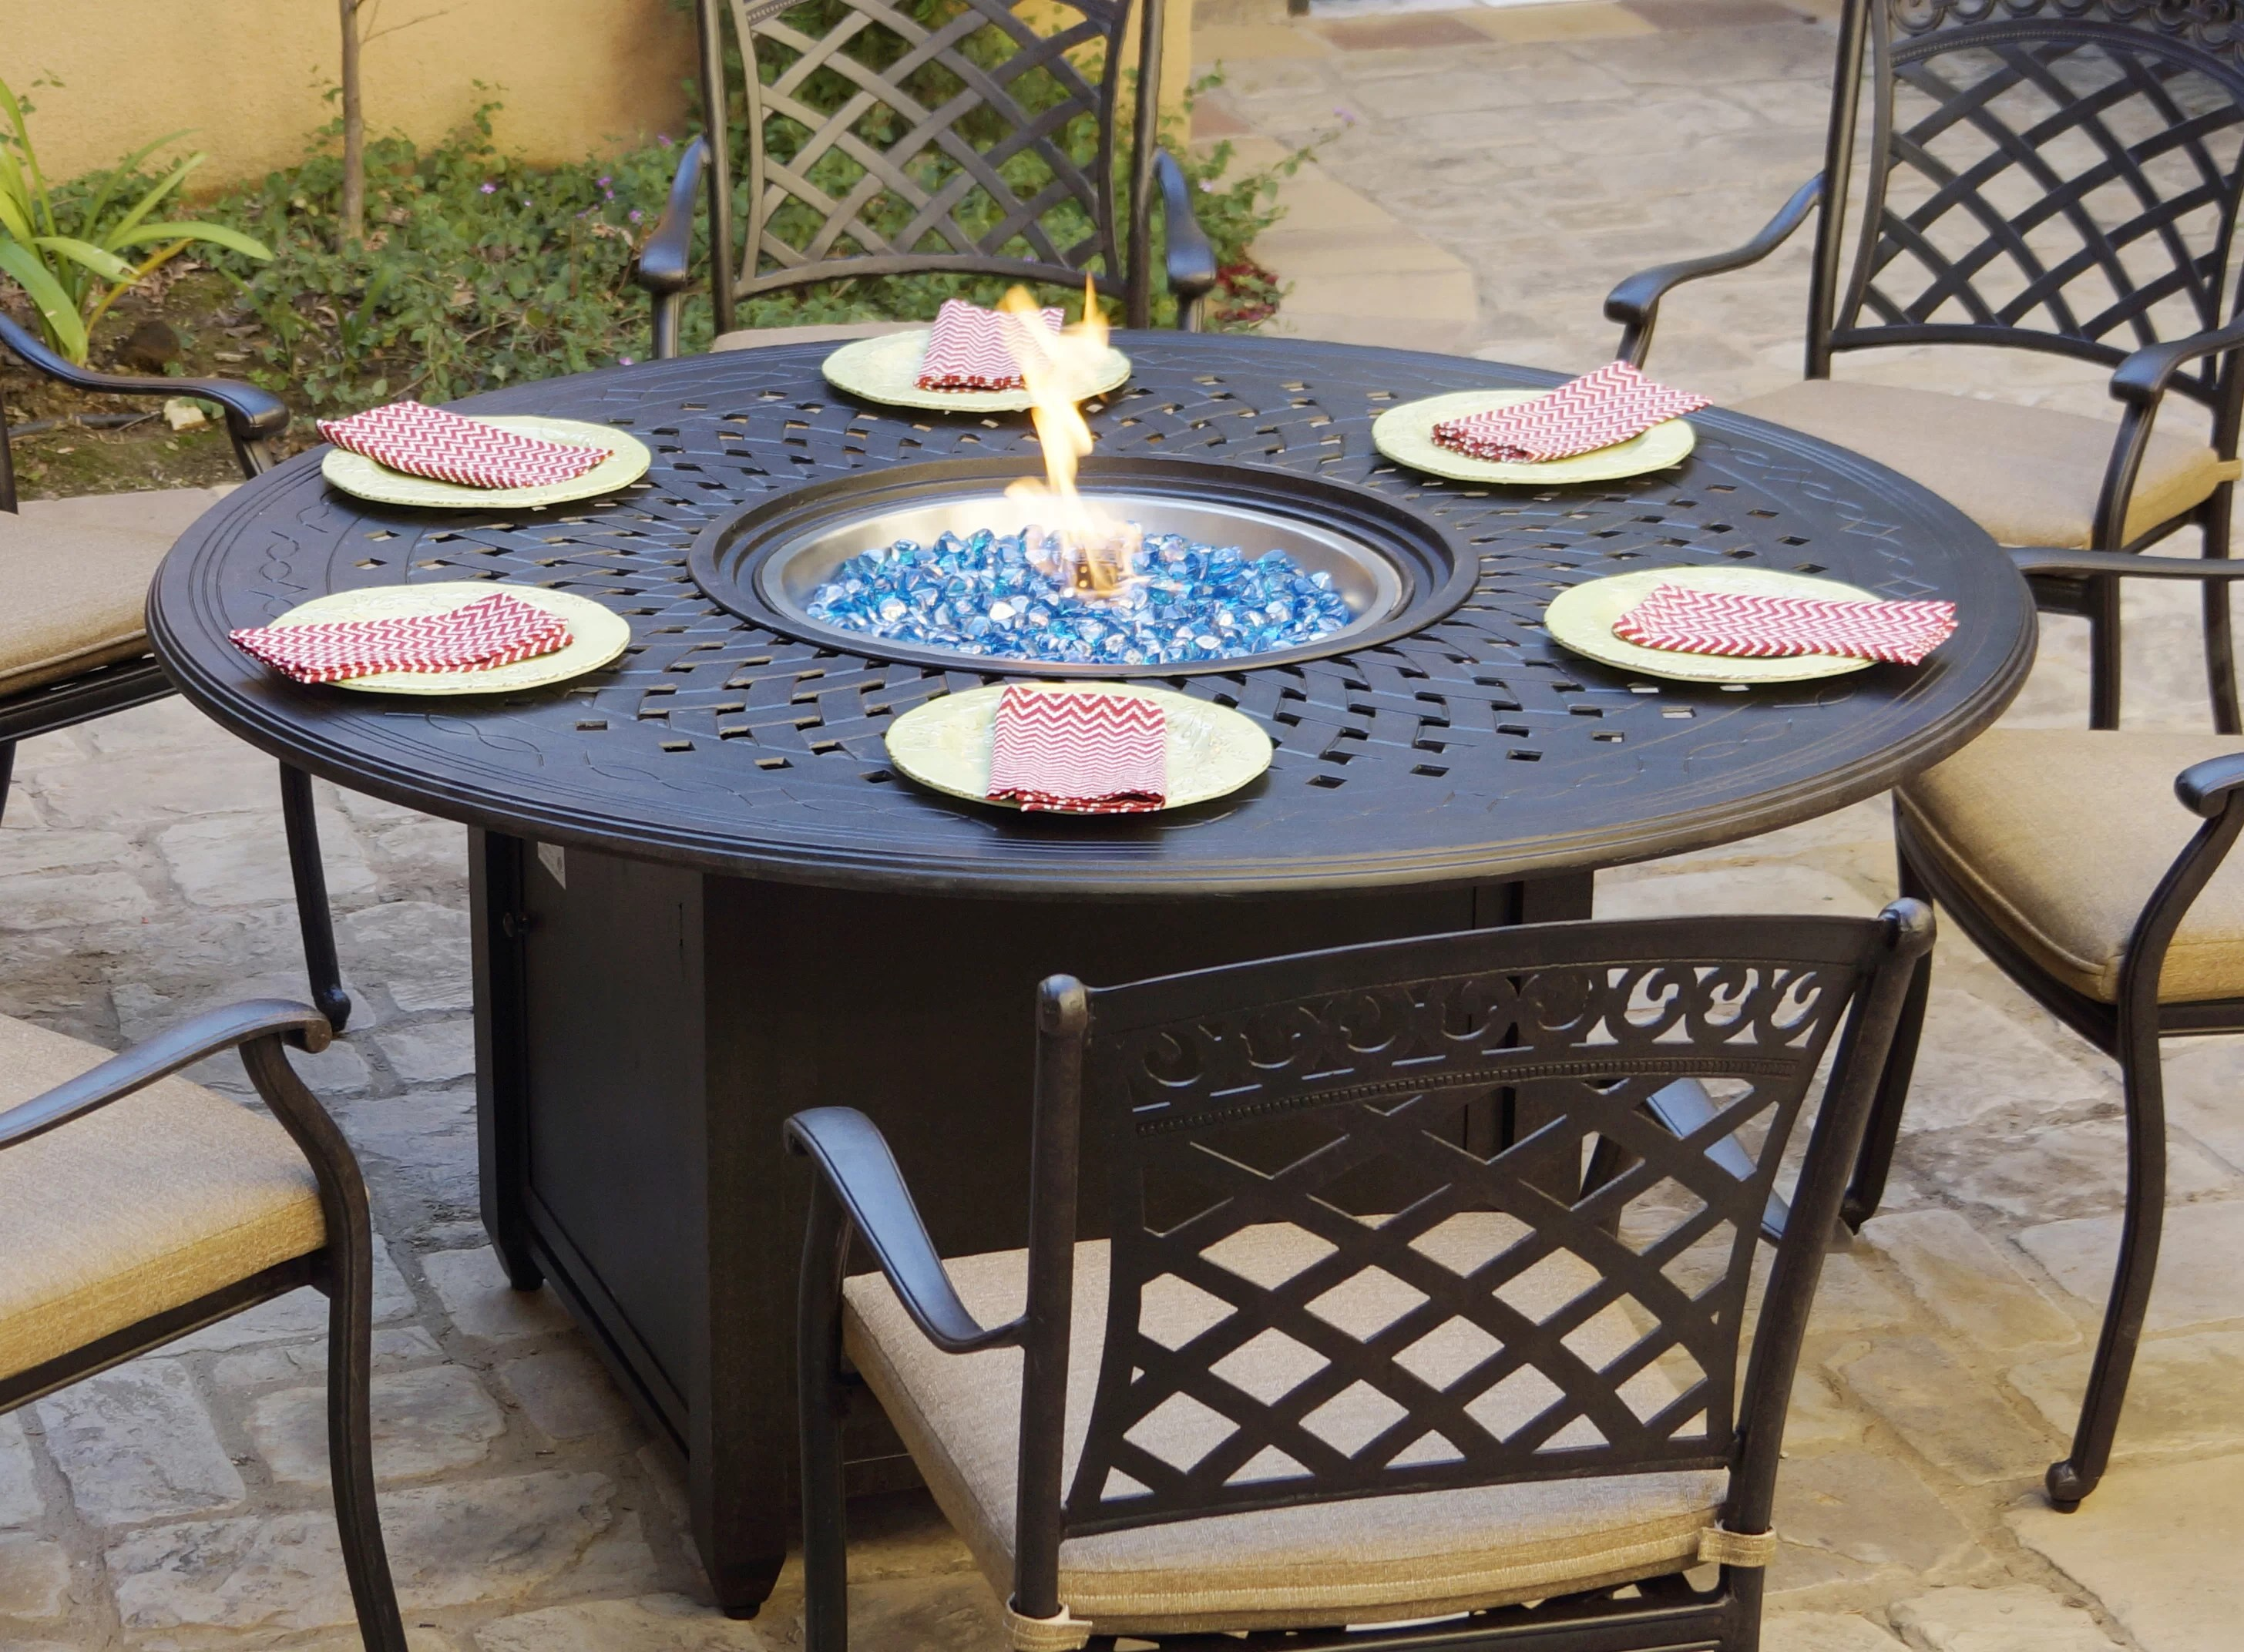 slavens 29 h x 60 w aluminum propane outdoor fire pit table